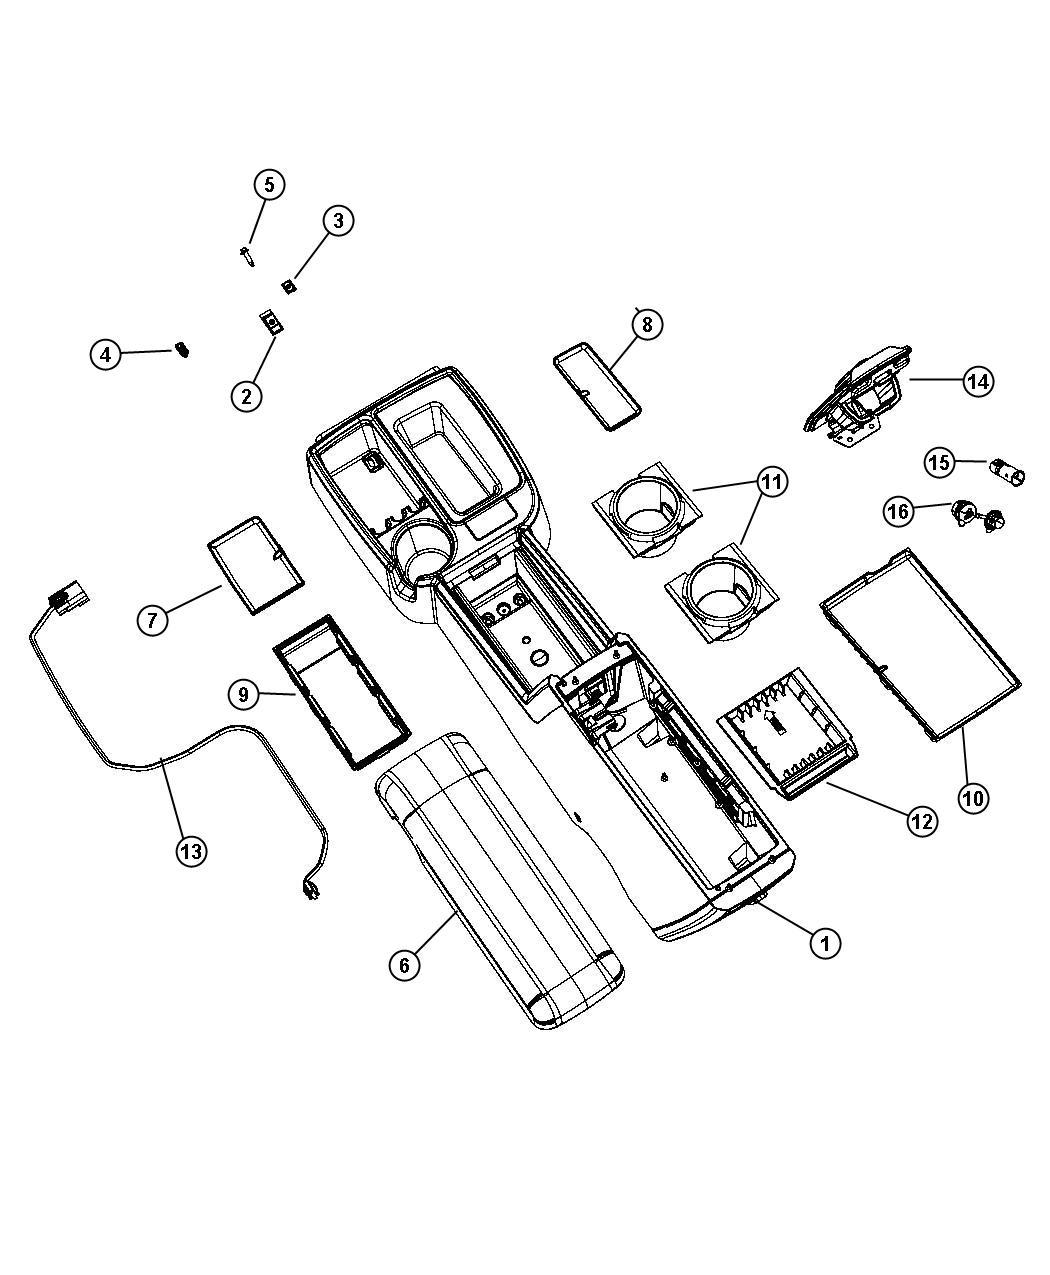 Dodge Dakota Lid. Center console storage. Trim: [all trim